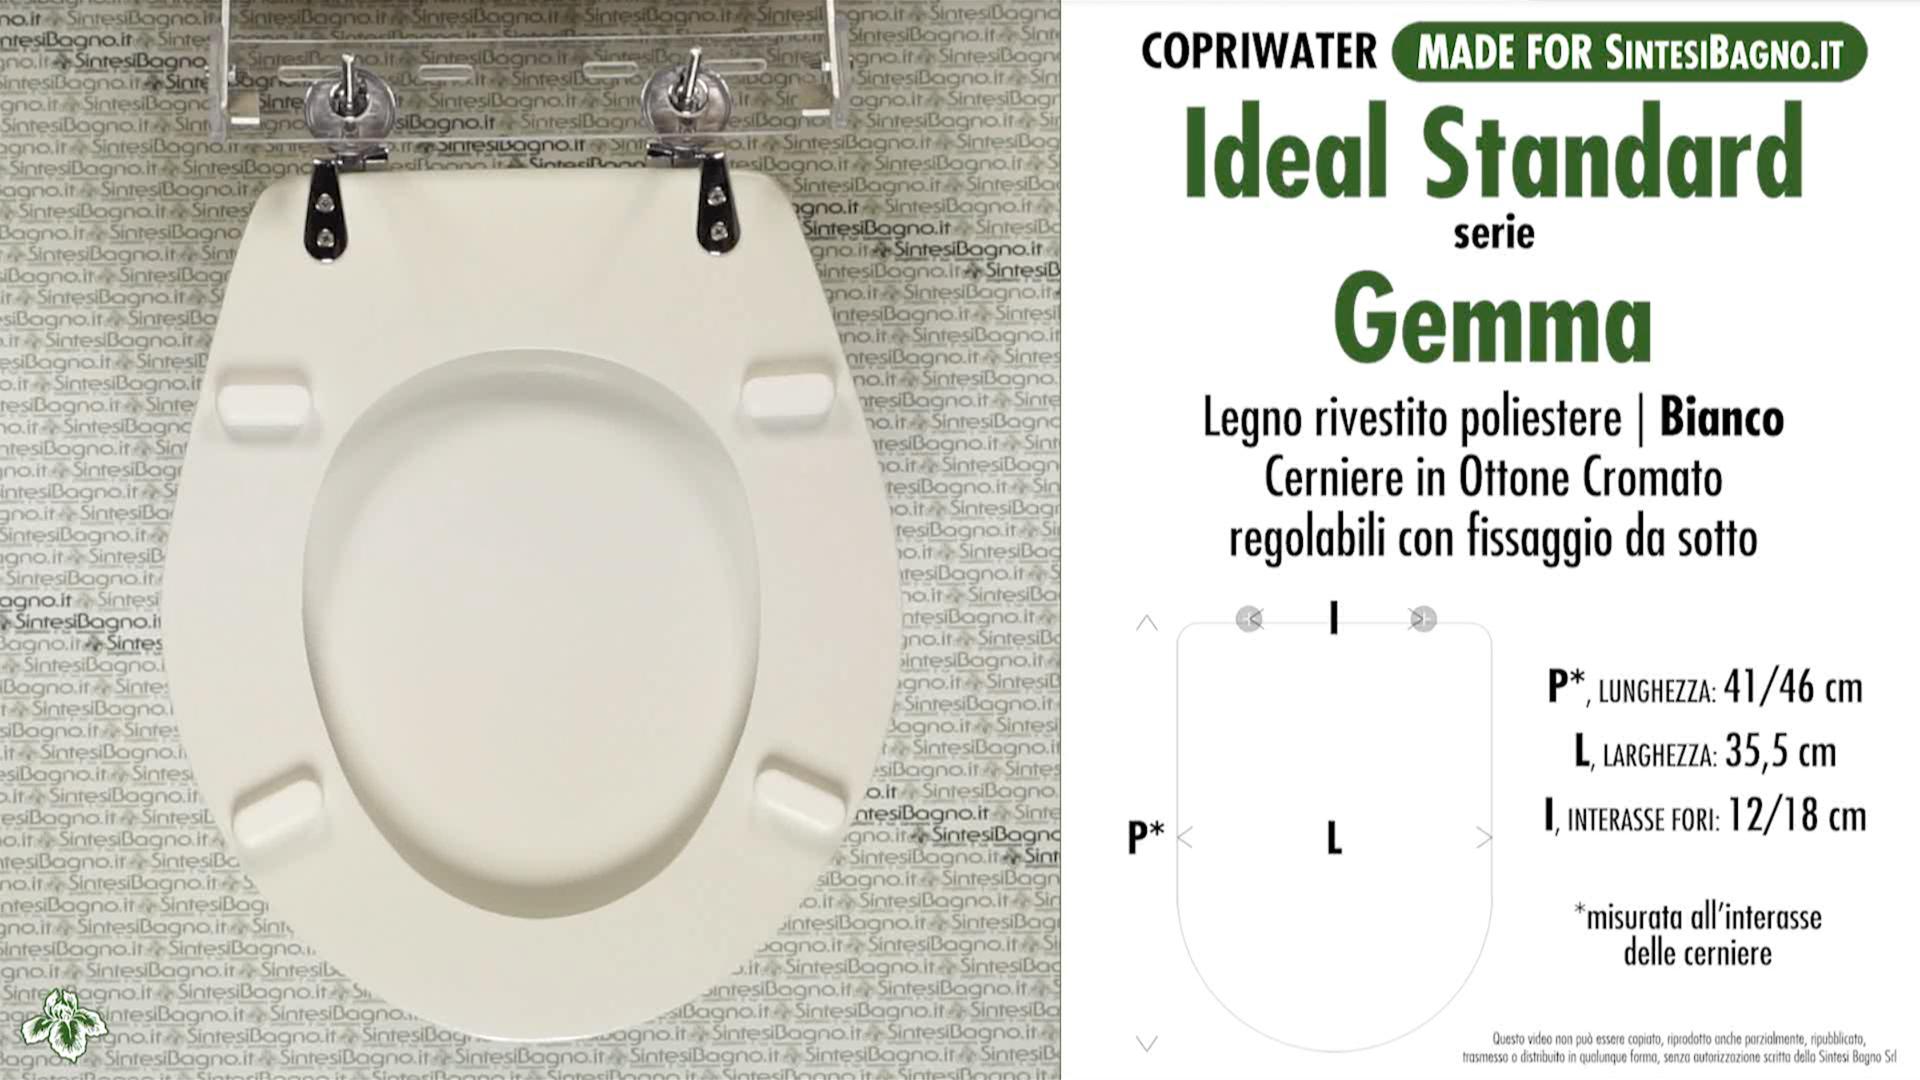 SCHEDA TECNICA MISURE copriwater IDEAL STANDARD GEMMA